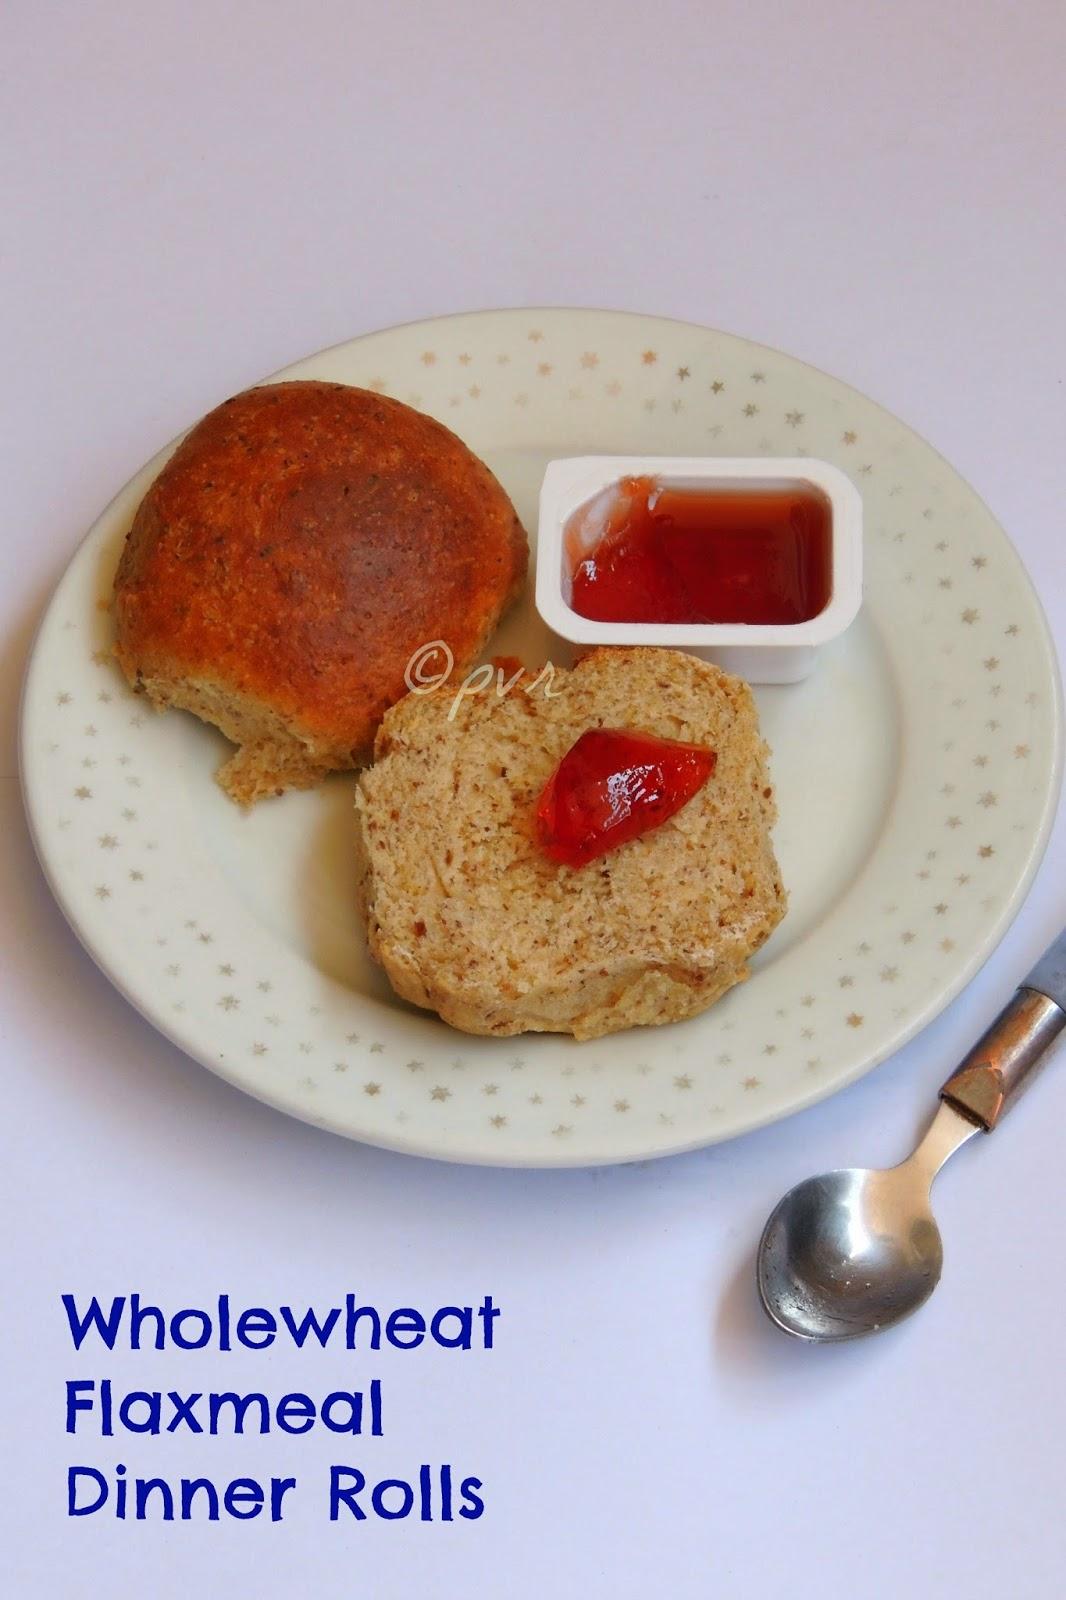 Eggless flaxmeal dinner rolls